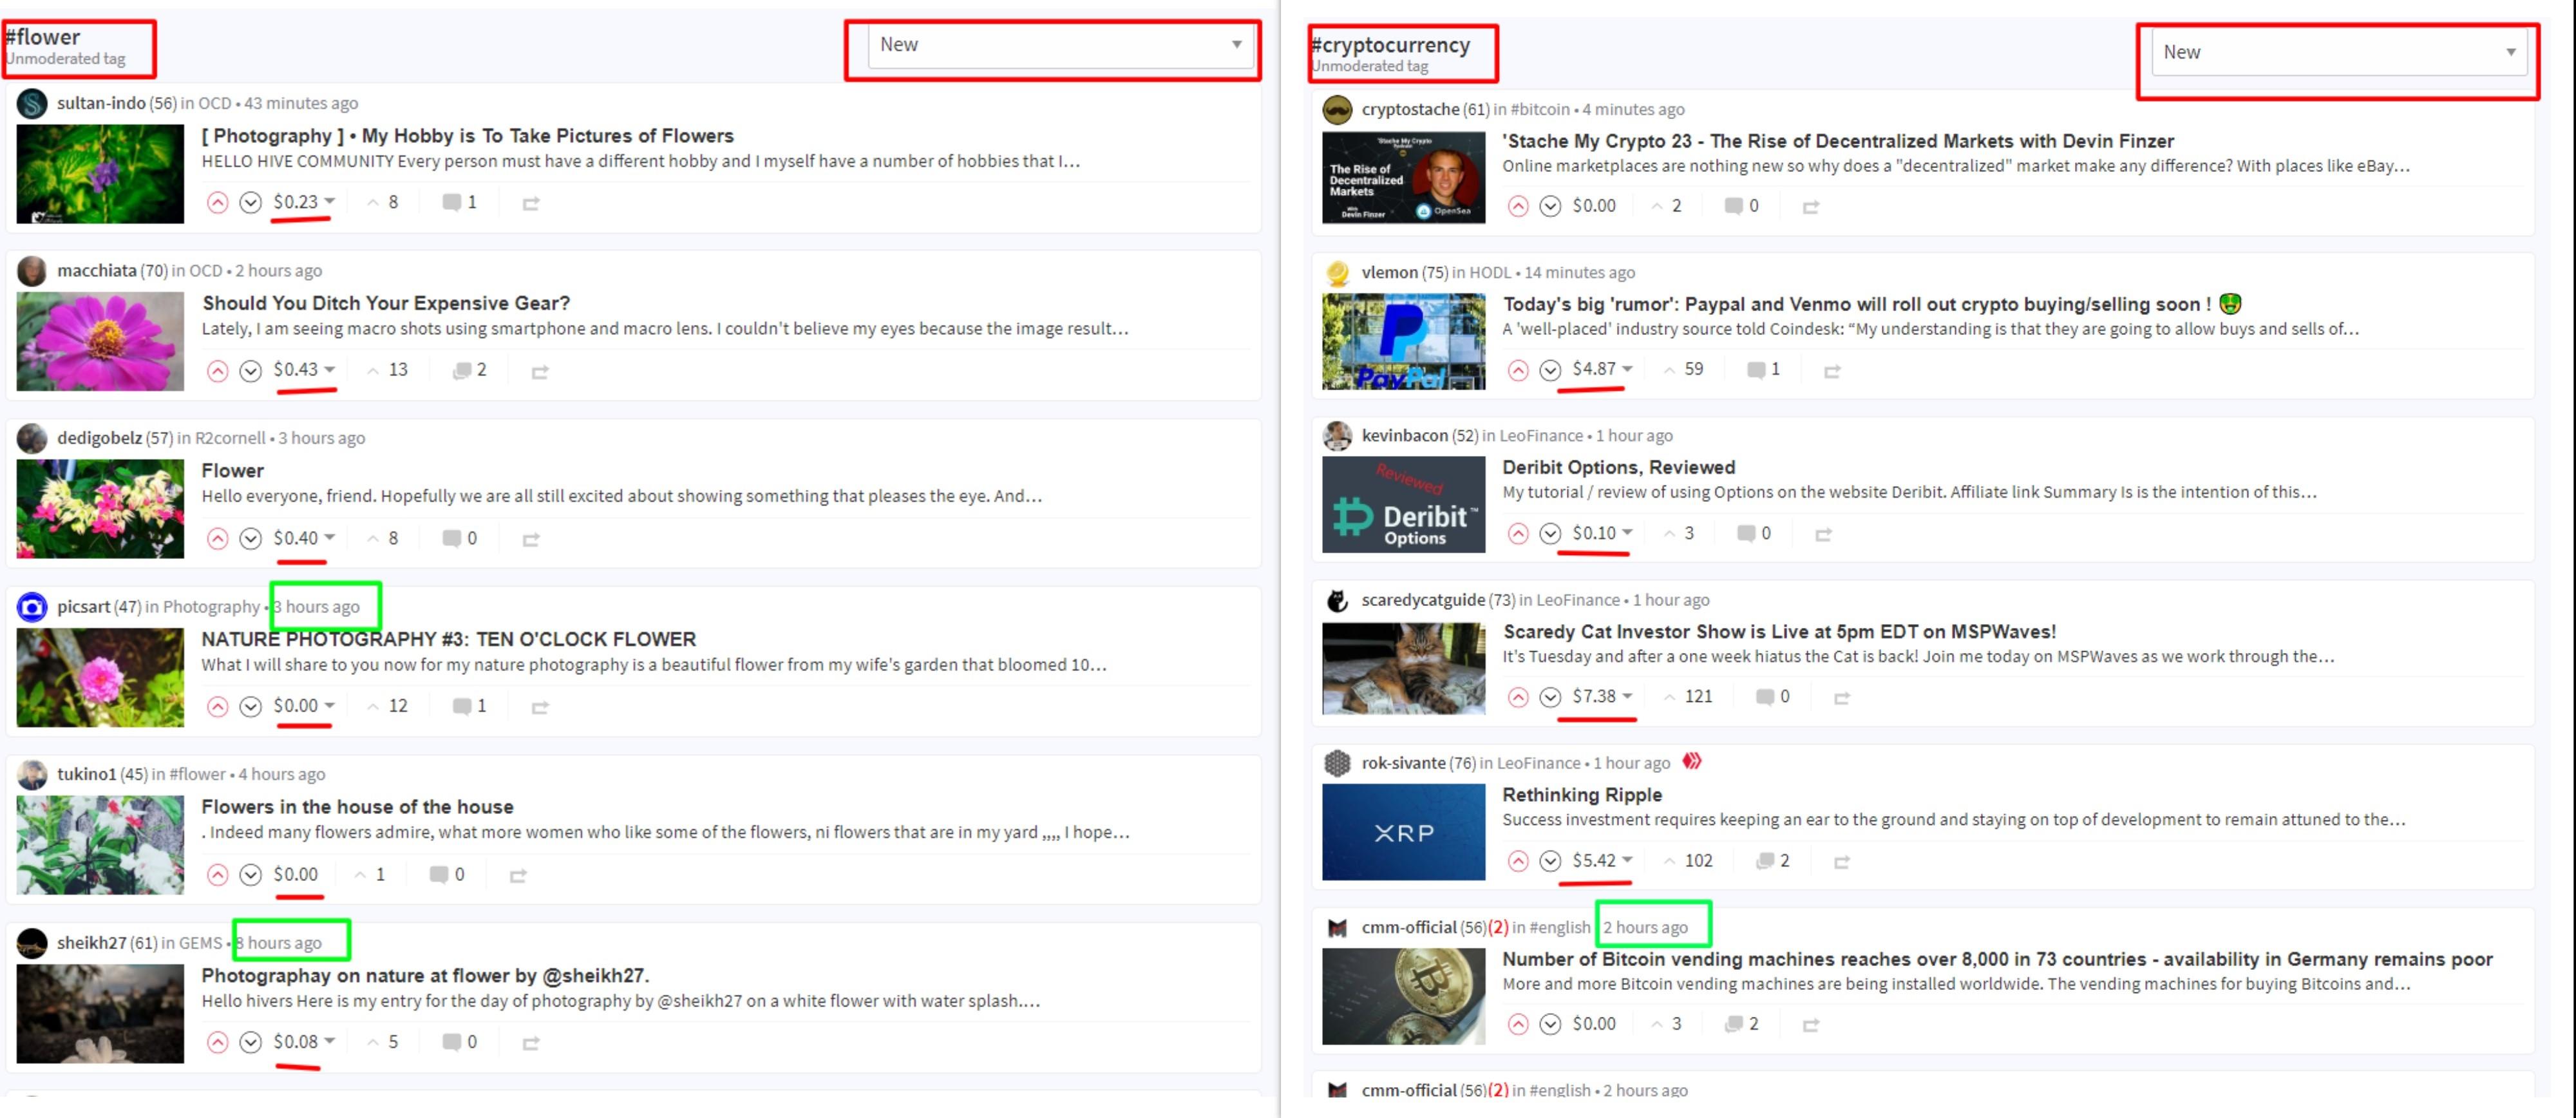 popularity of tag 3 re.jpg